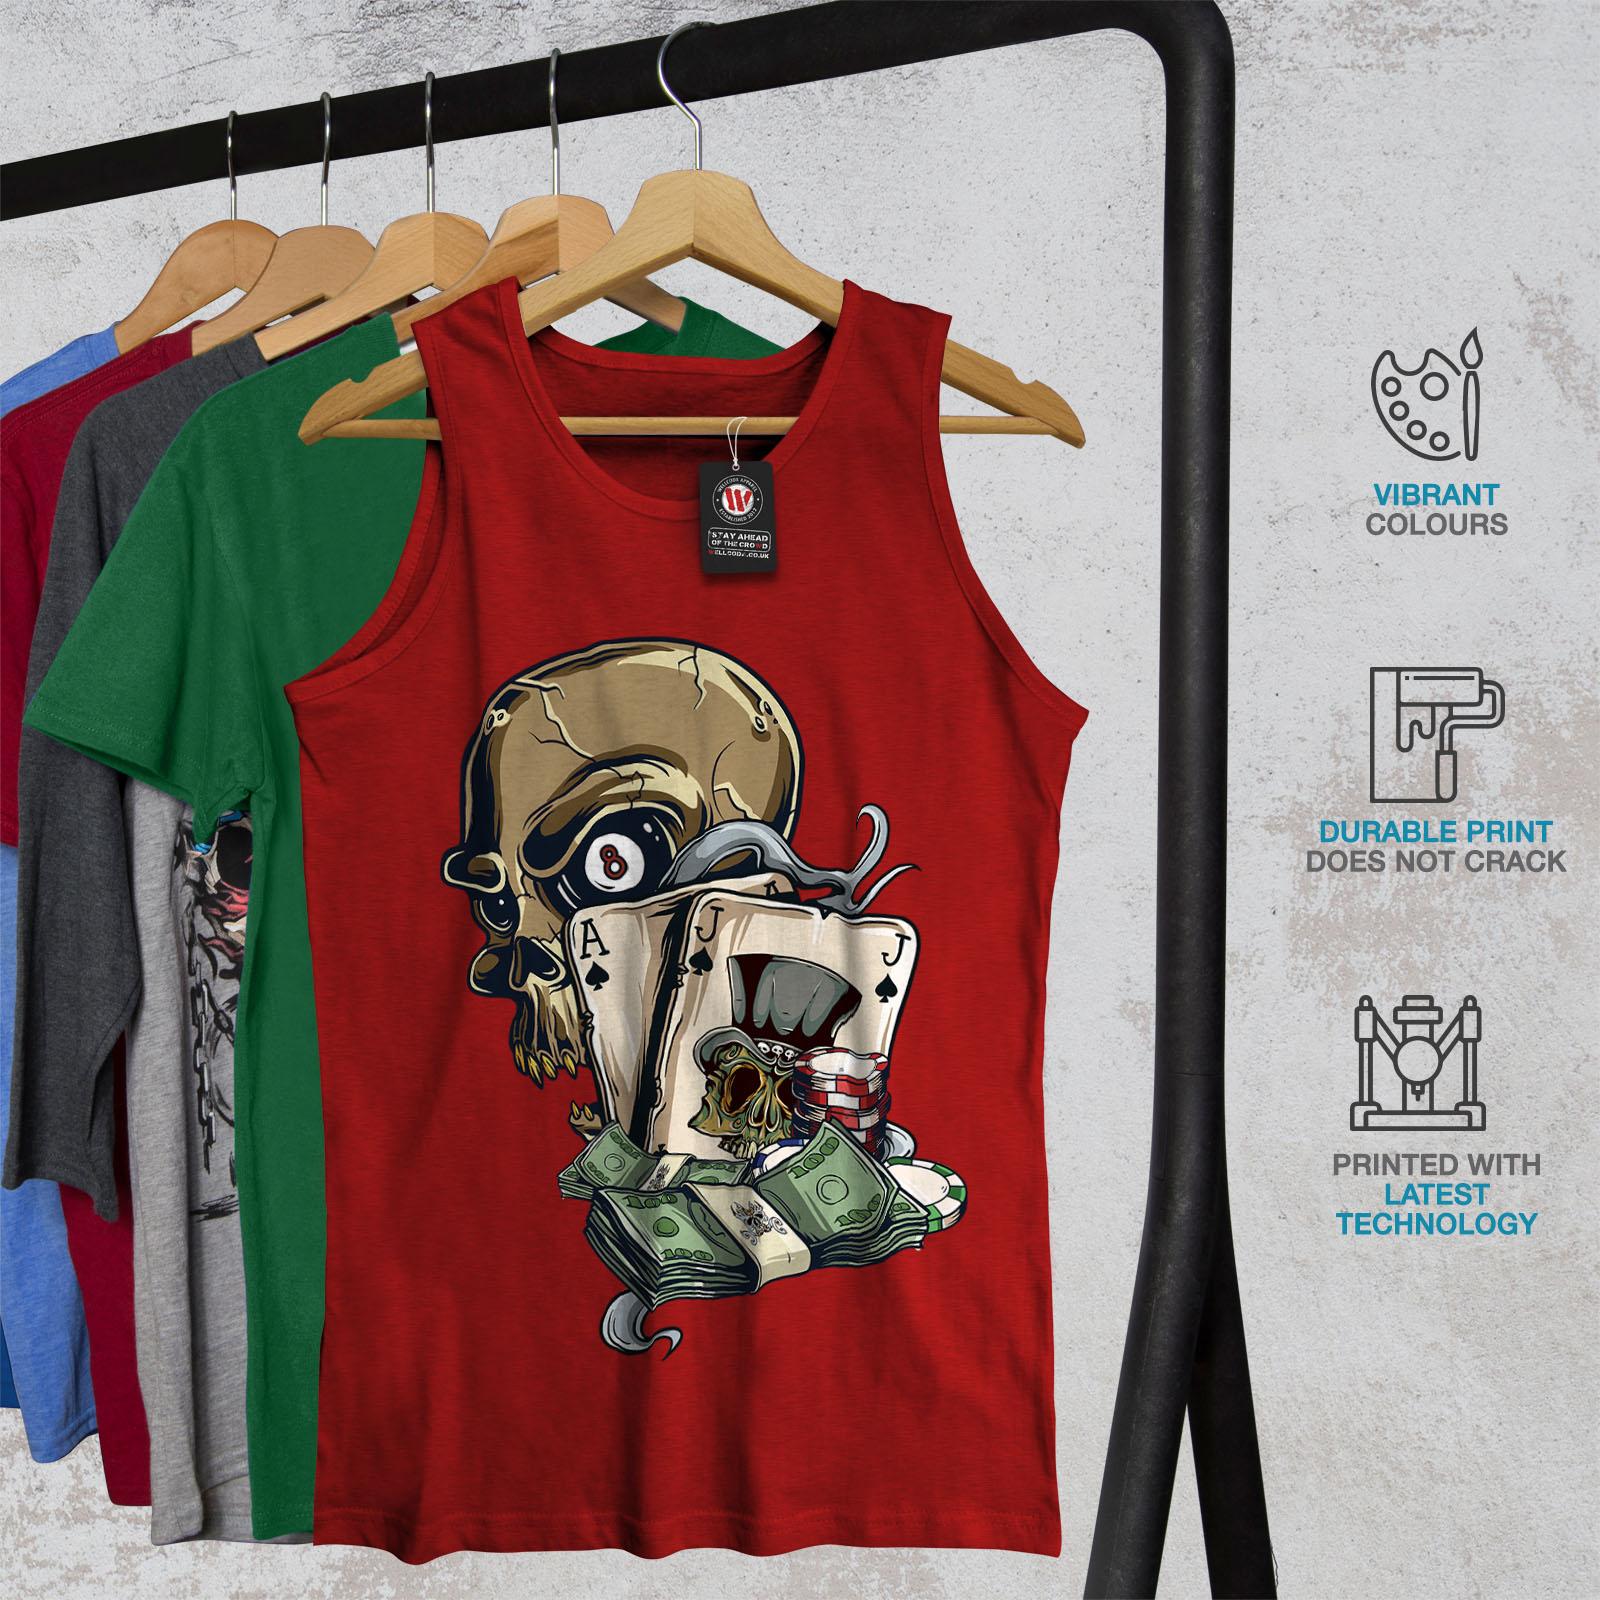 jouer Gamble Active Sports Shirt Wellcoda Crâne Poker Card Homme Tank Top